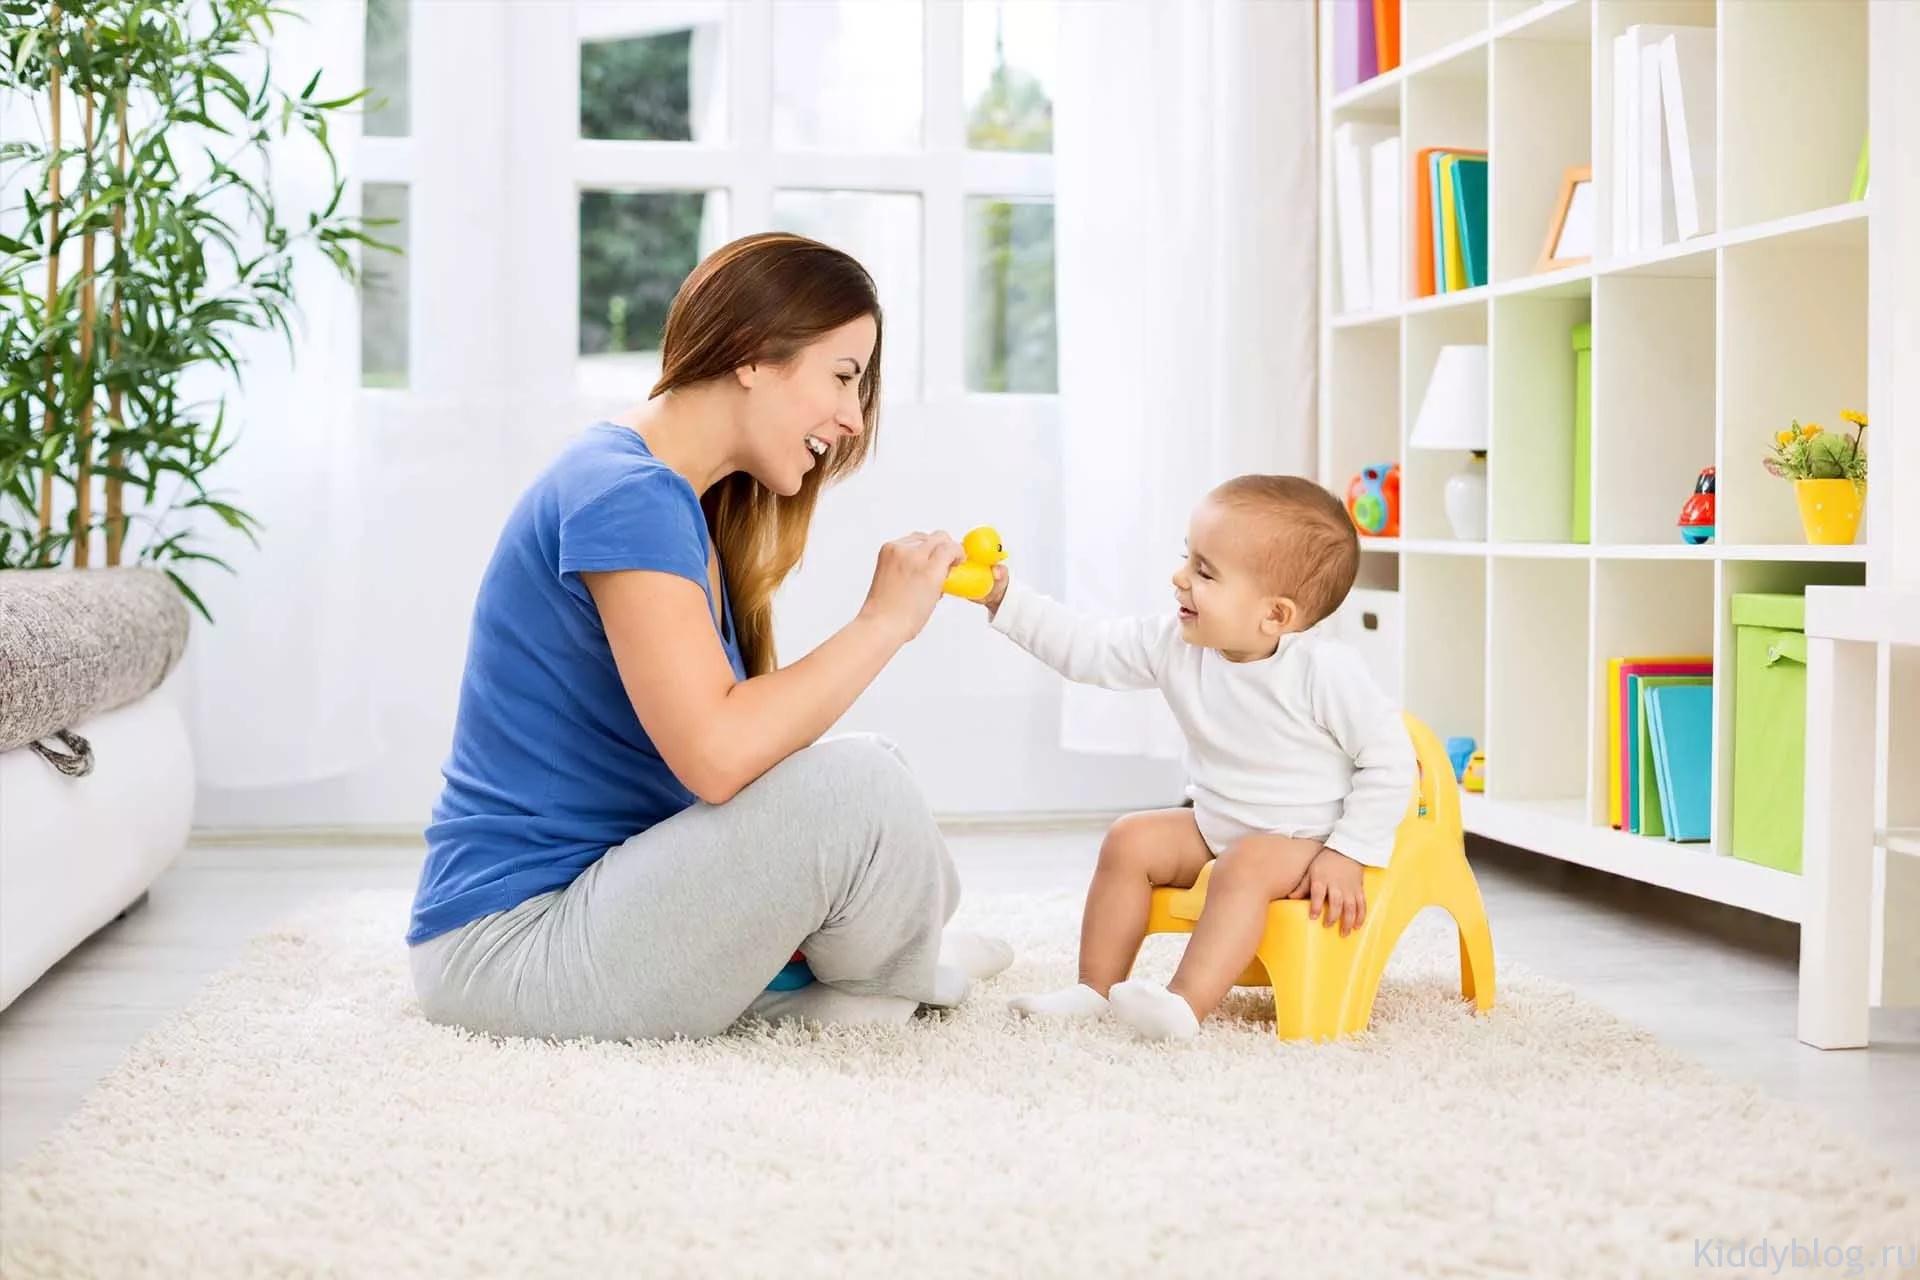 Мама приучает ребёнка к горшку 1